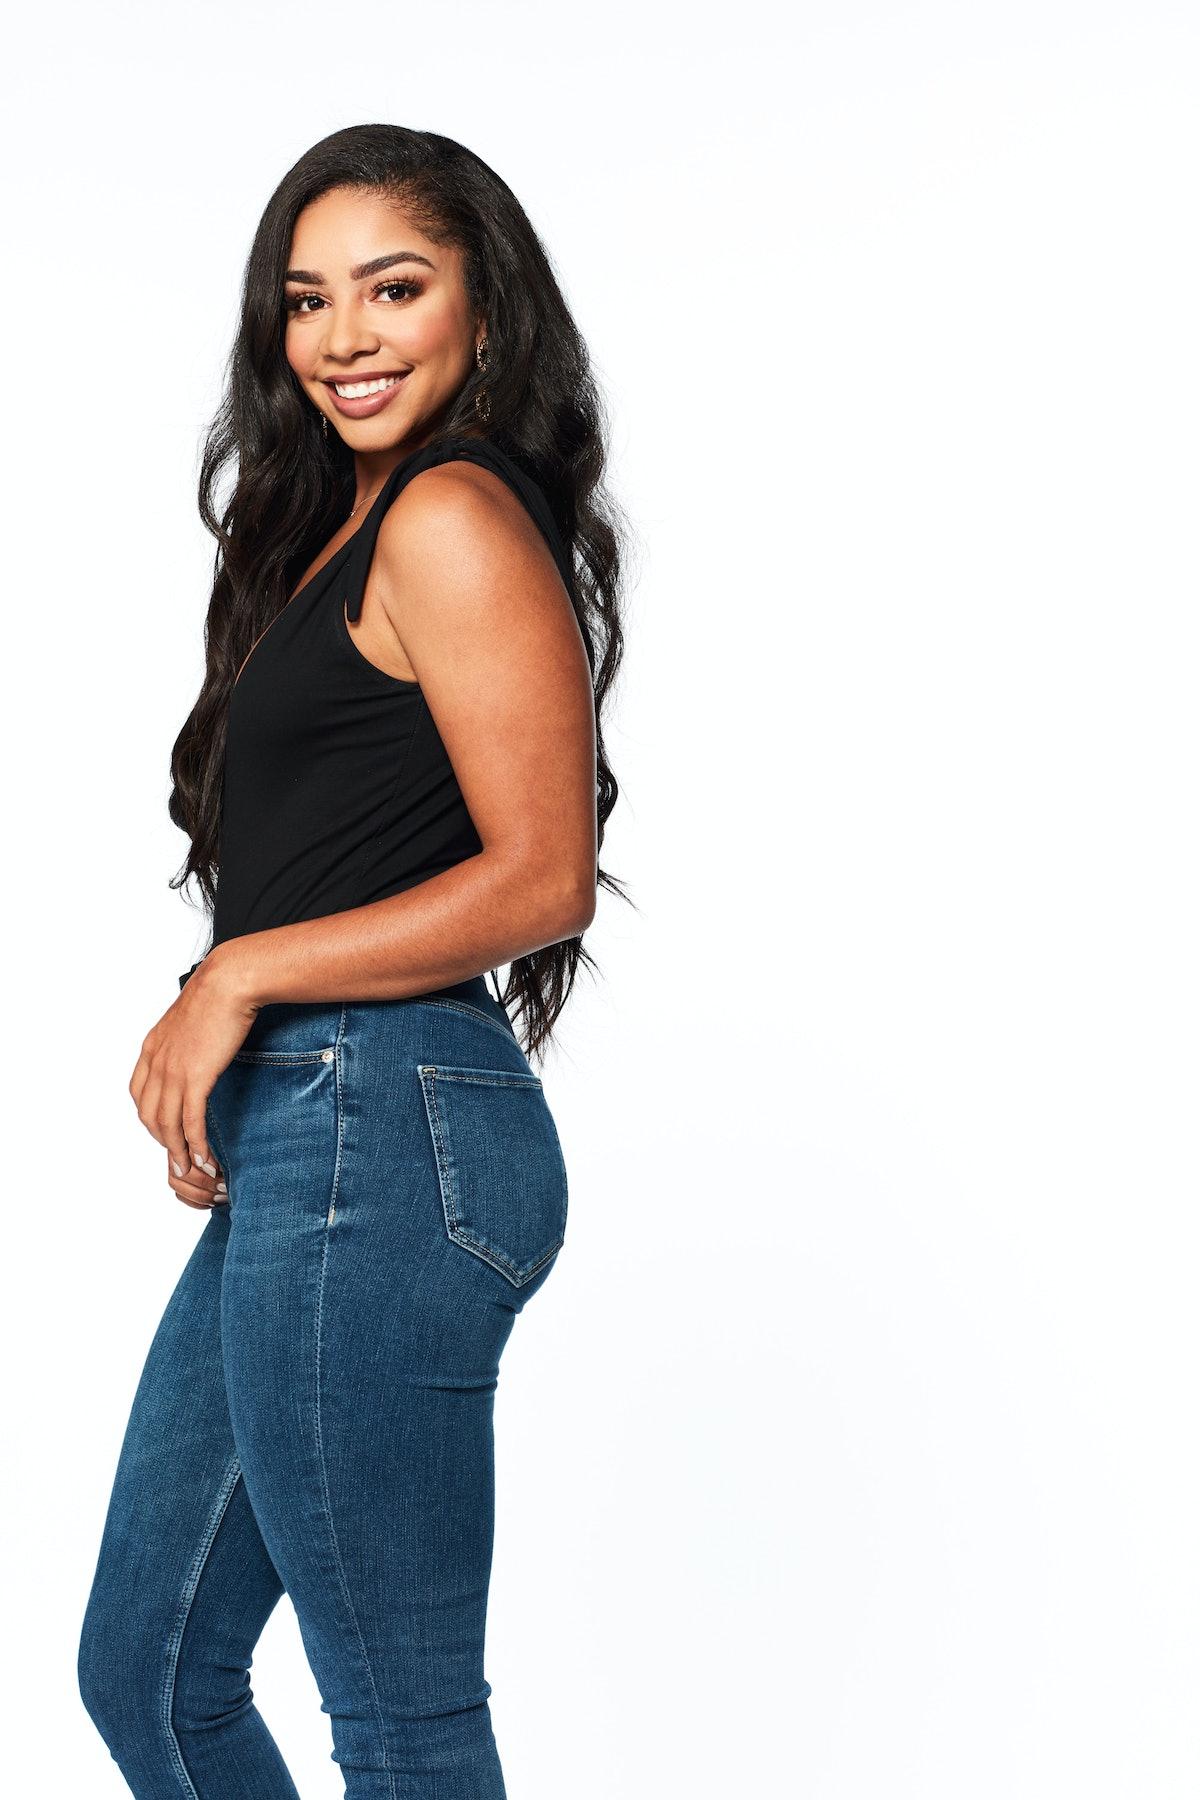 Deandra on 'The Bachelor'